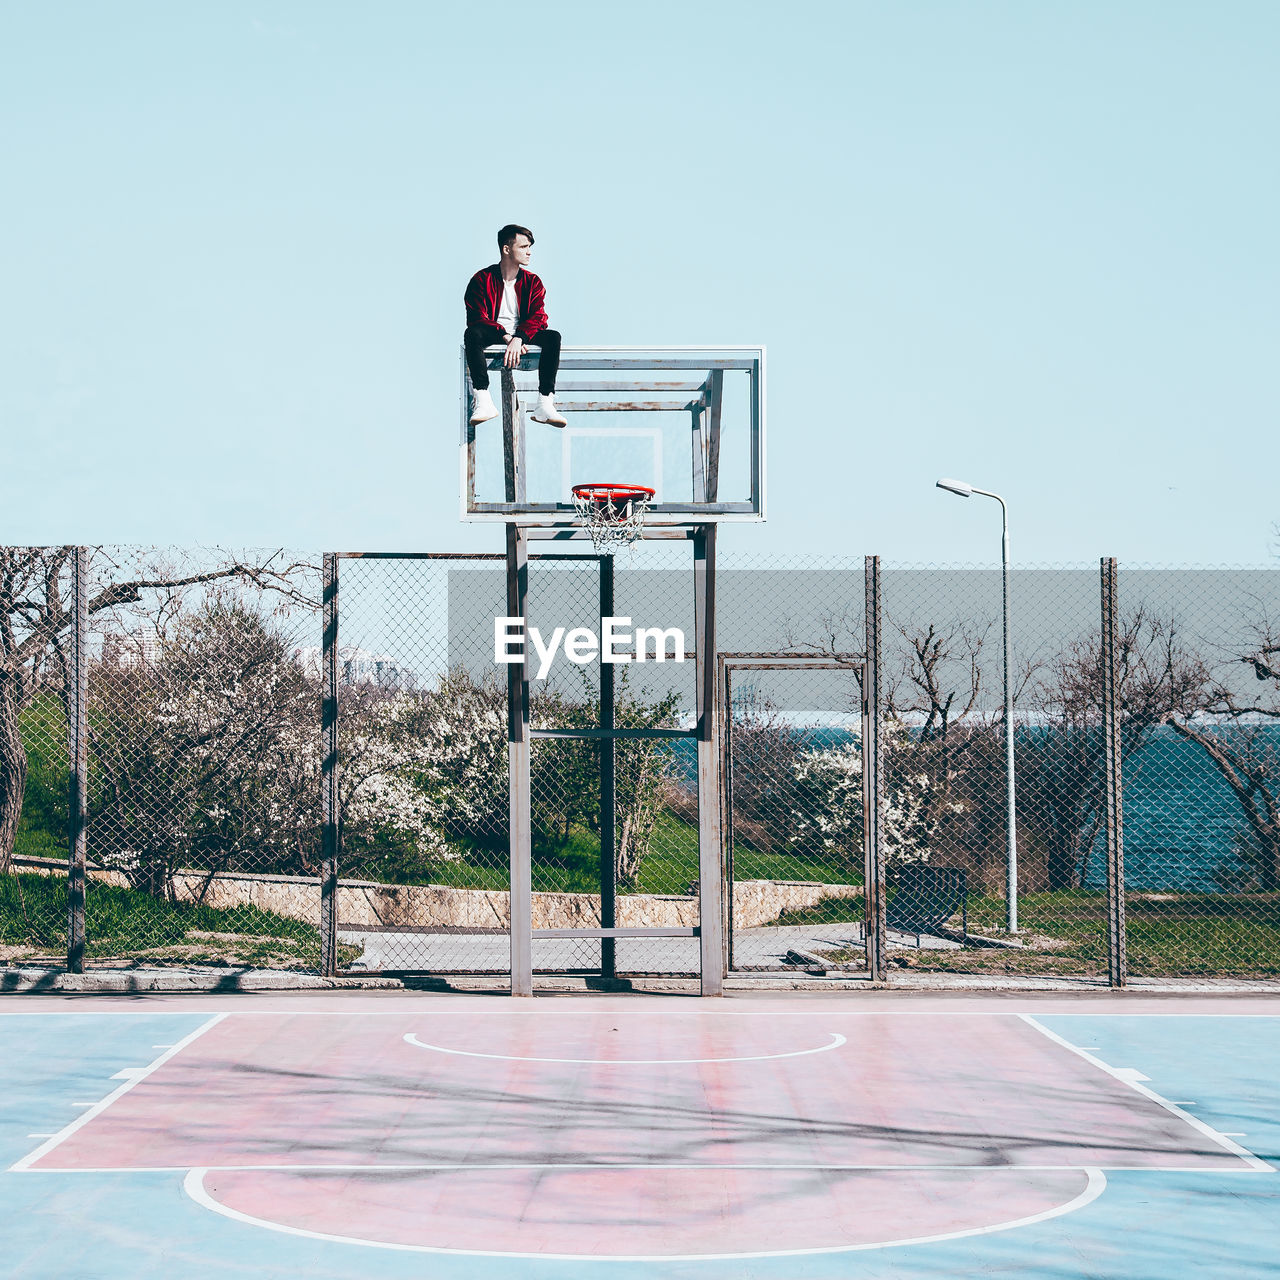 Man Sitting On Basketball Hoop Against Sky